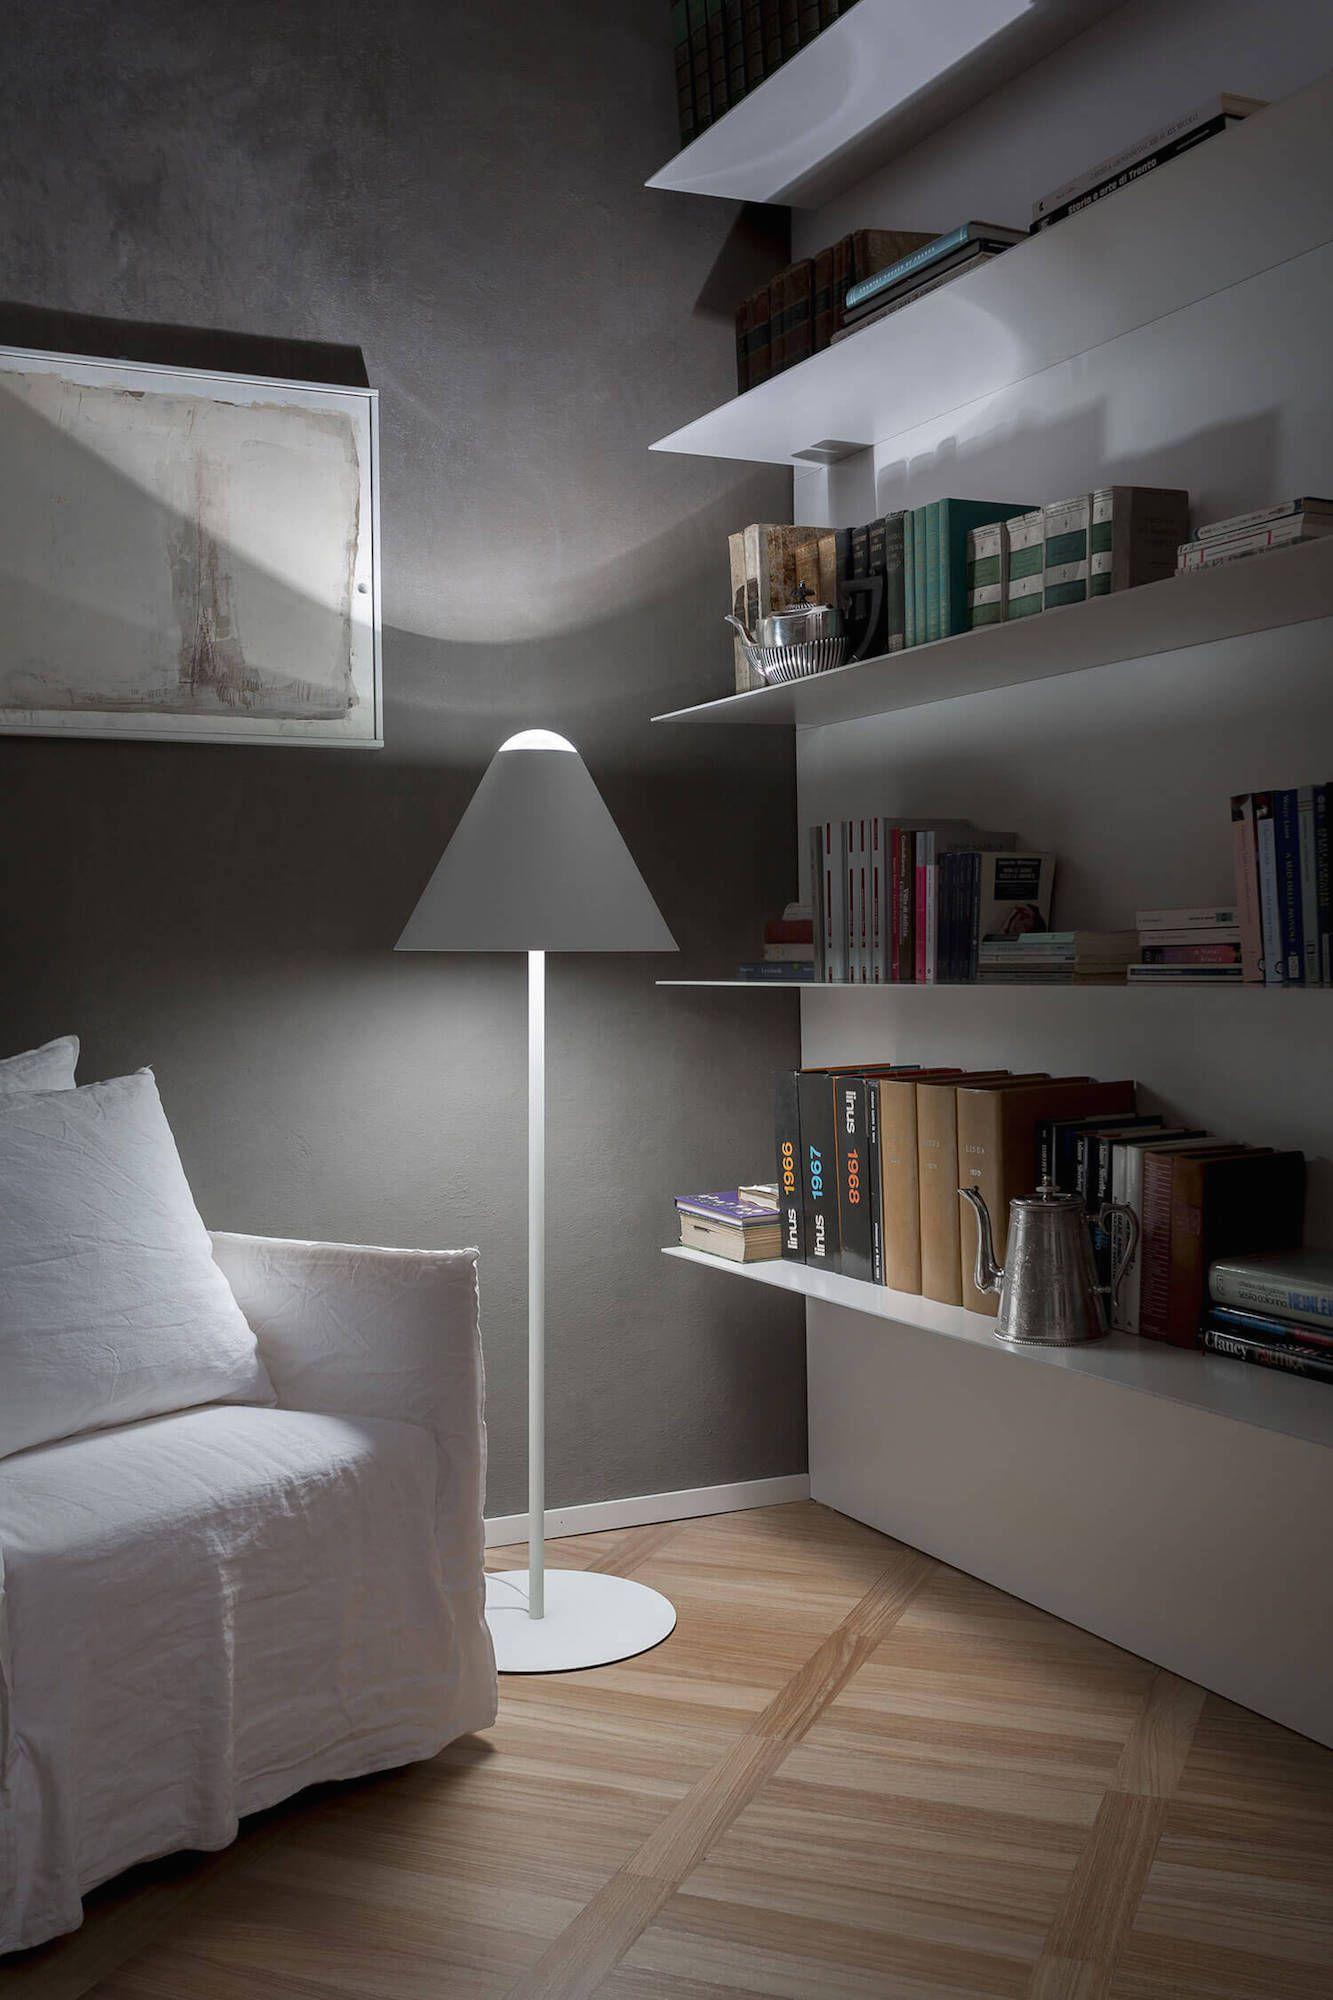 apartment-piacenza-studio-blesi-subitoni-13